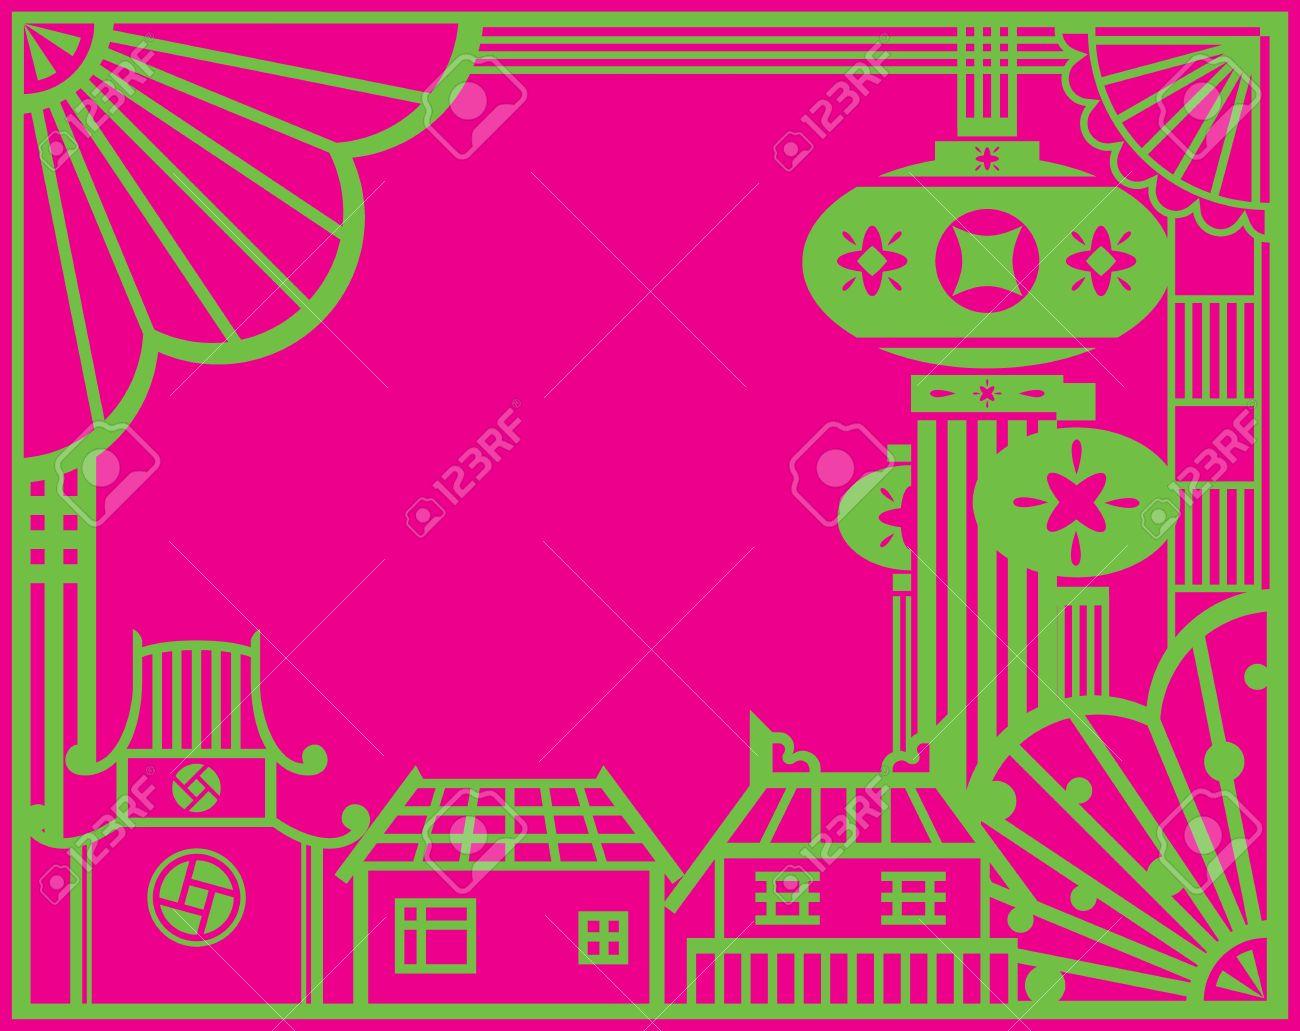 chinese paper cut village and lanterns design graphic design